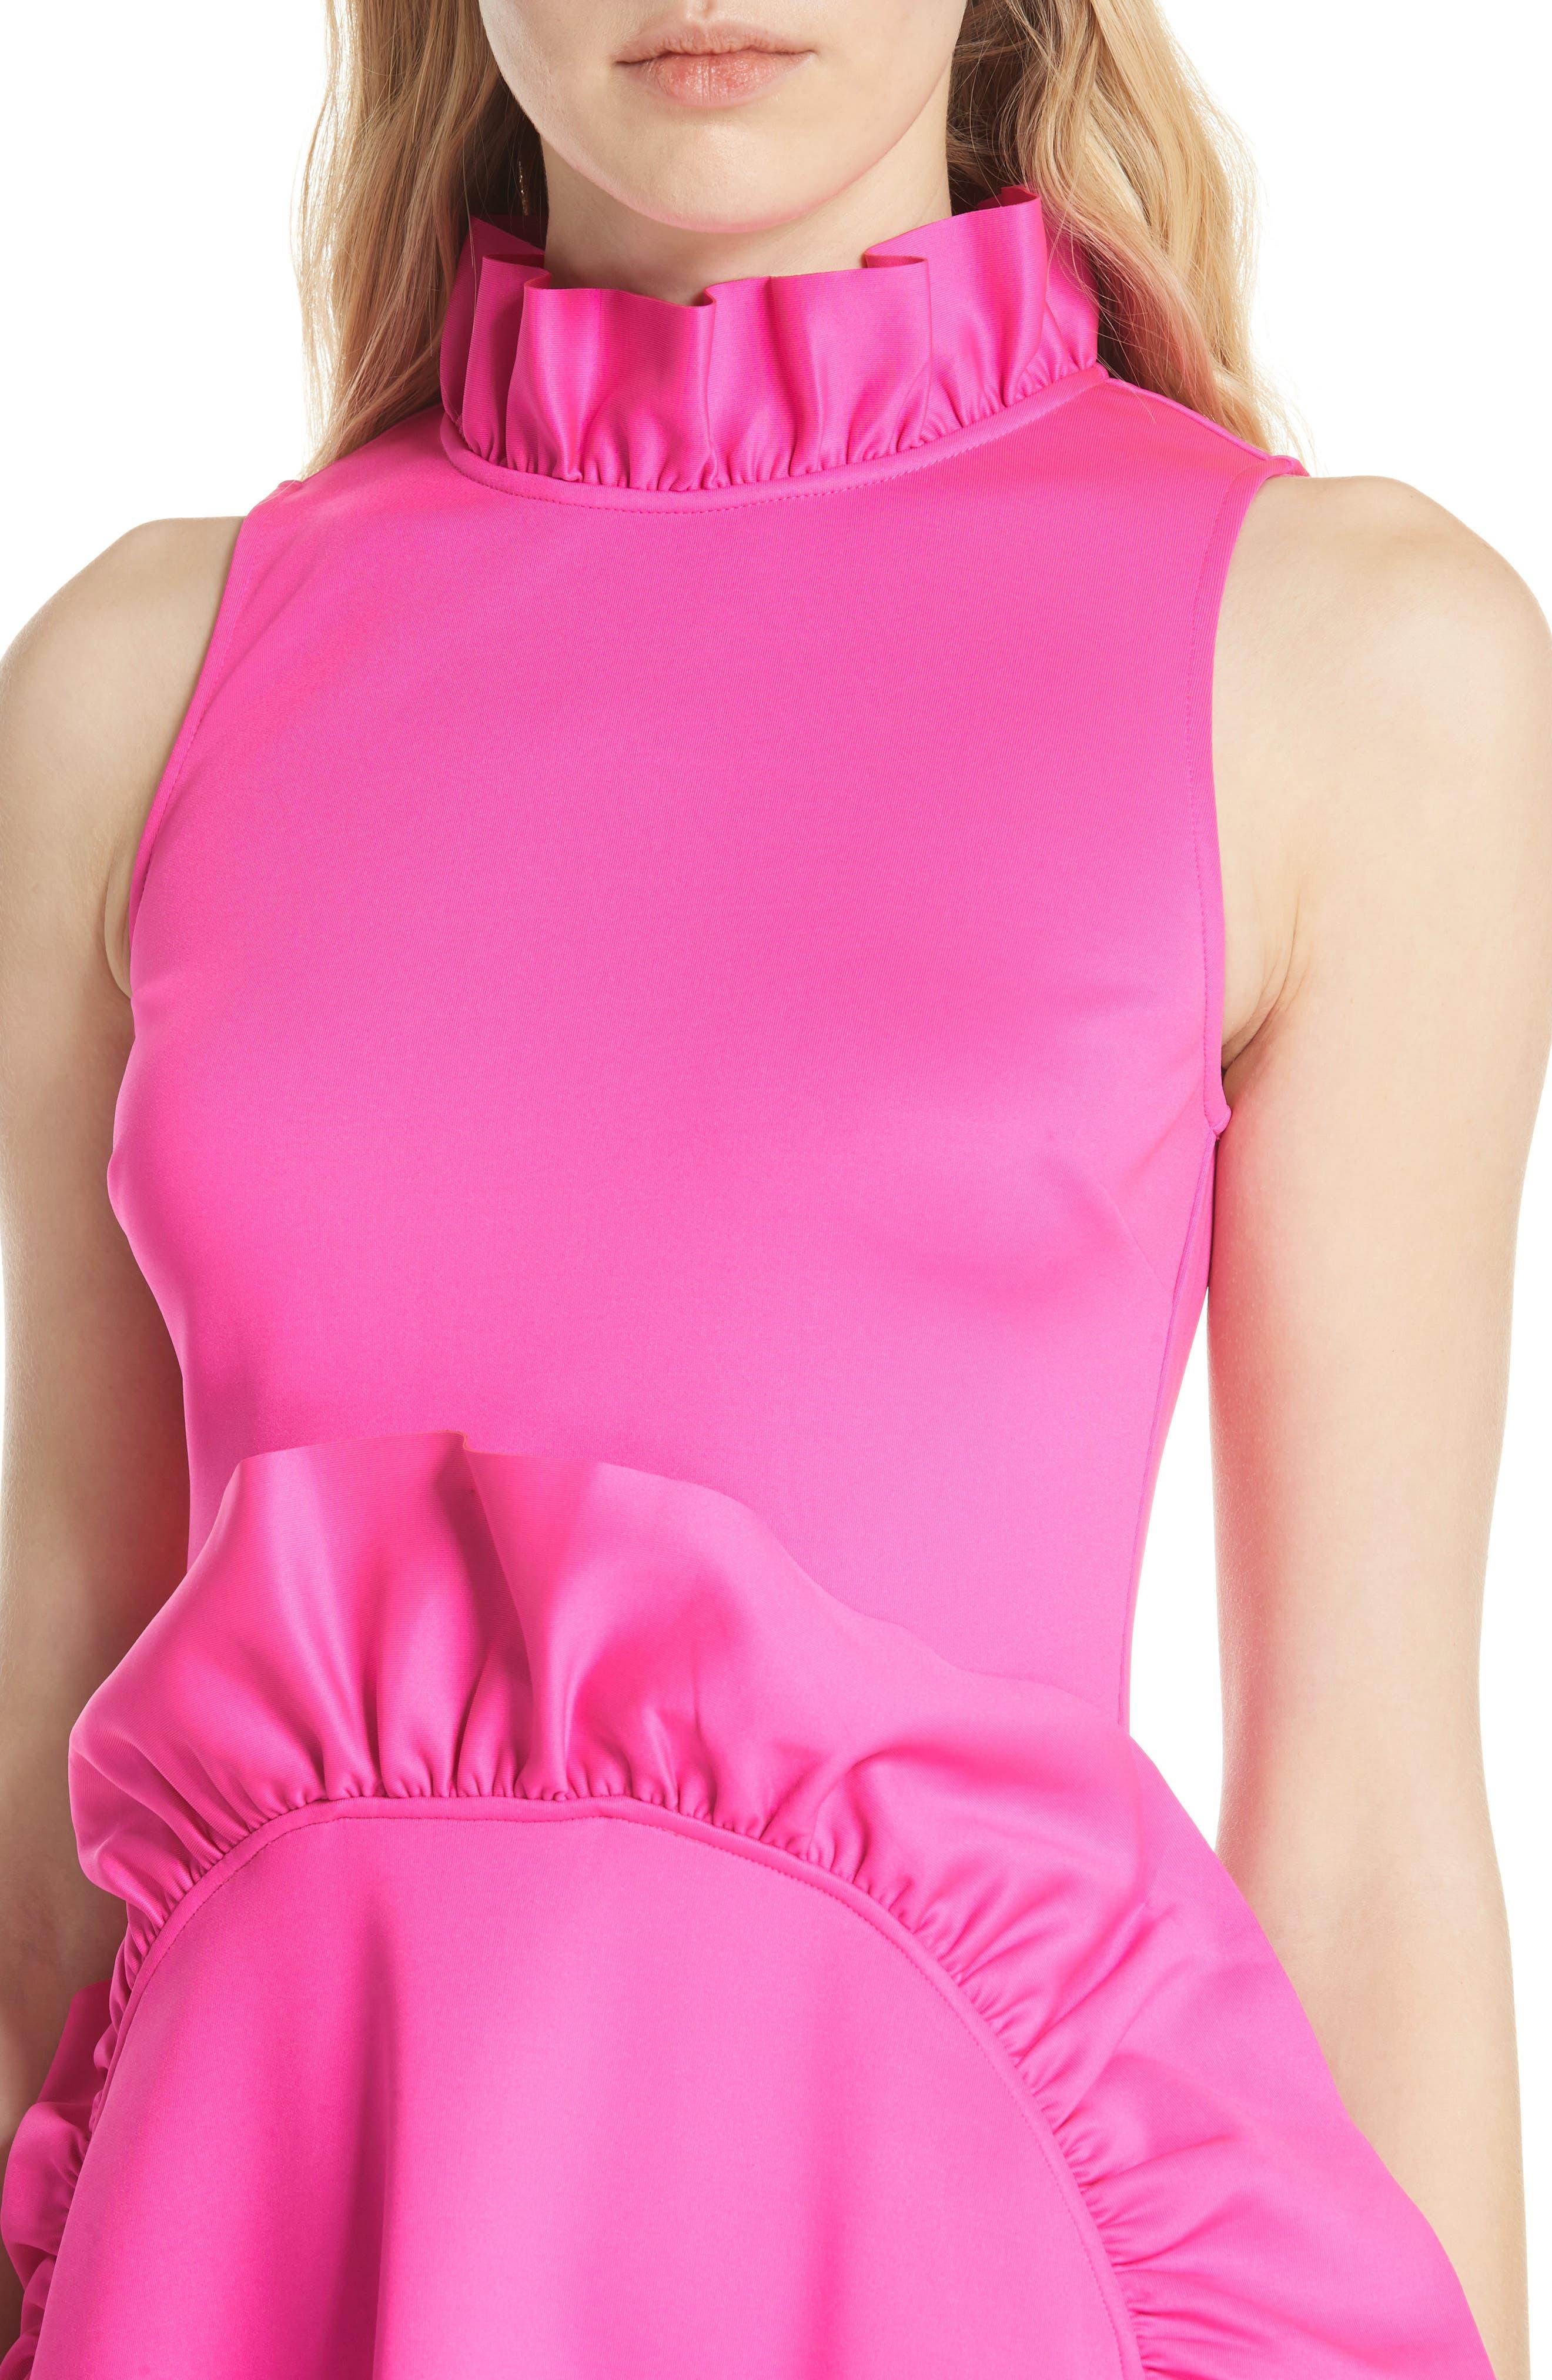 Jannett Laser Cut Ruffle Dress,                             Alternate thumbnail 4, color,                             Neon Pink